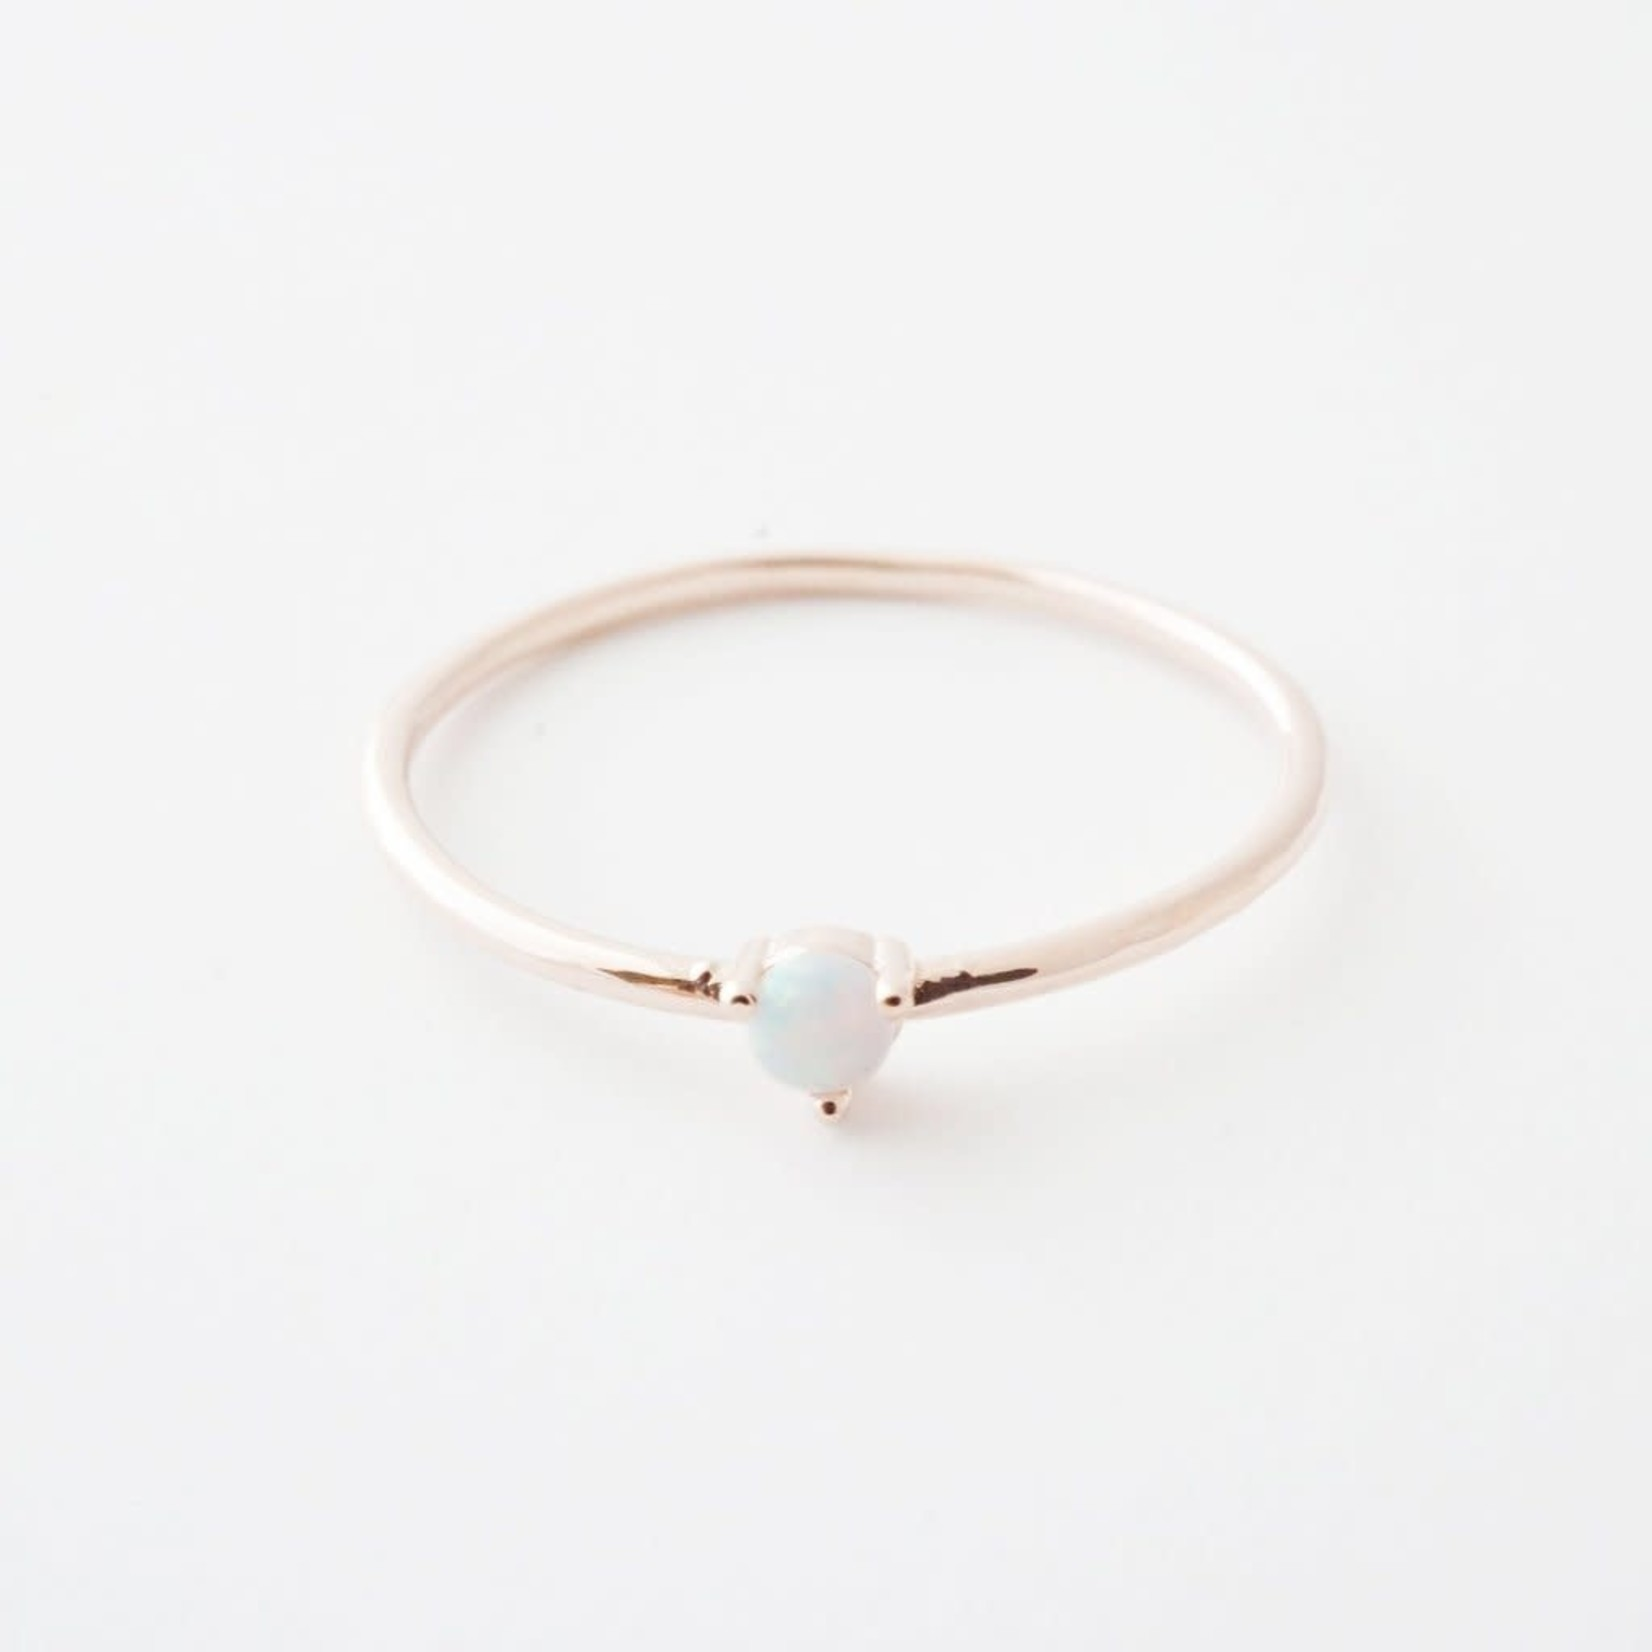 Honeycat Jewelry Honeycat Orb Ring Opal Rose Gold